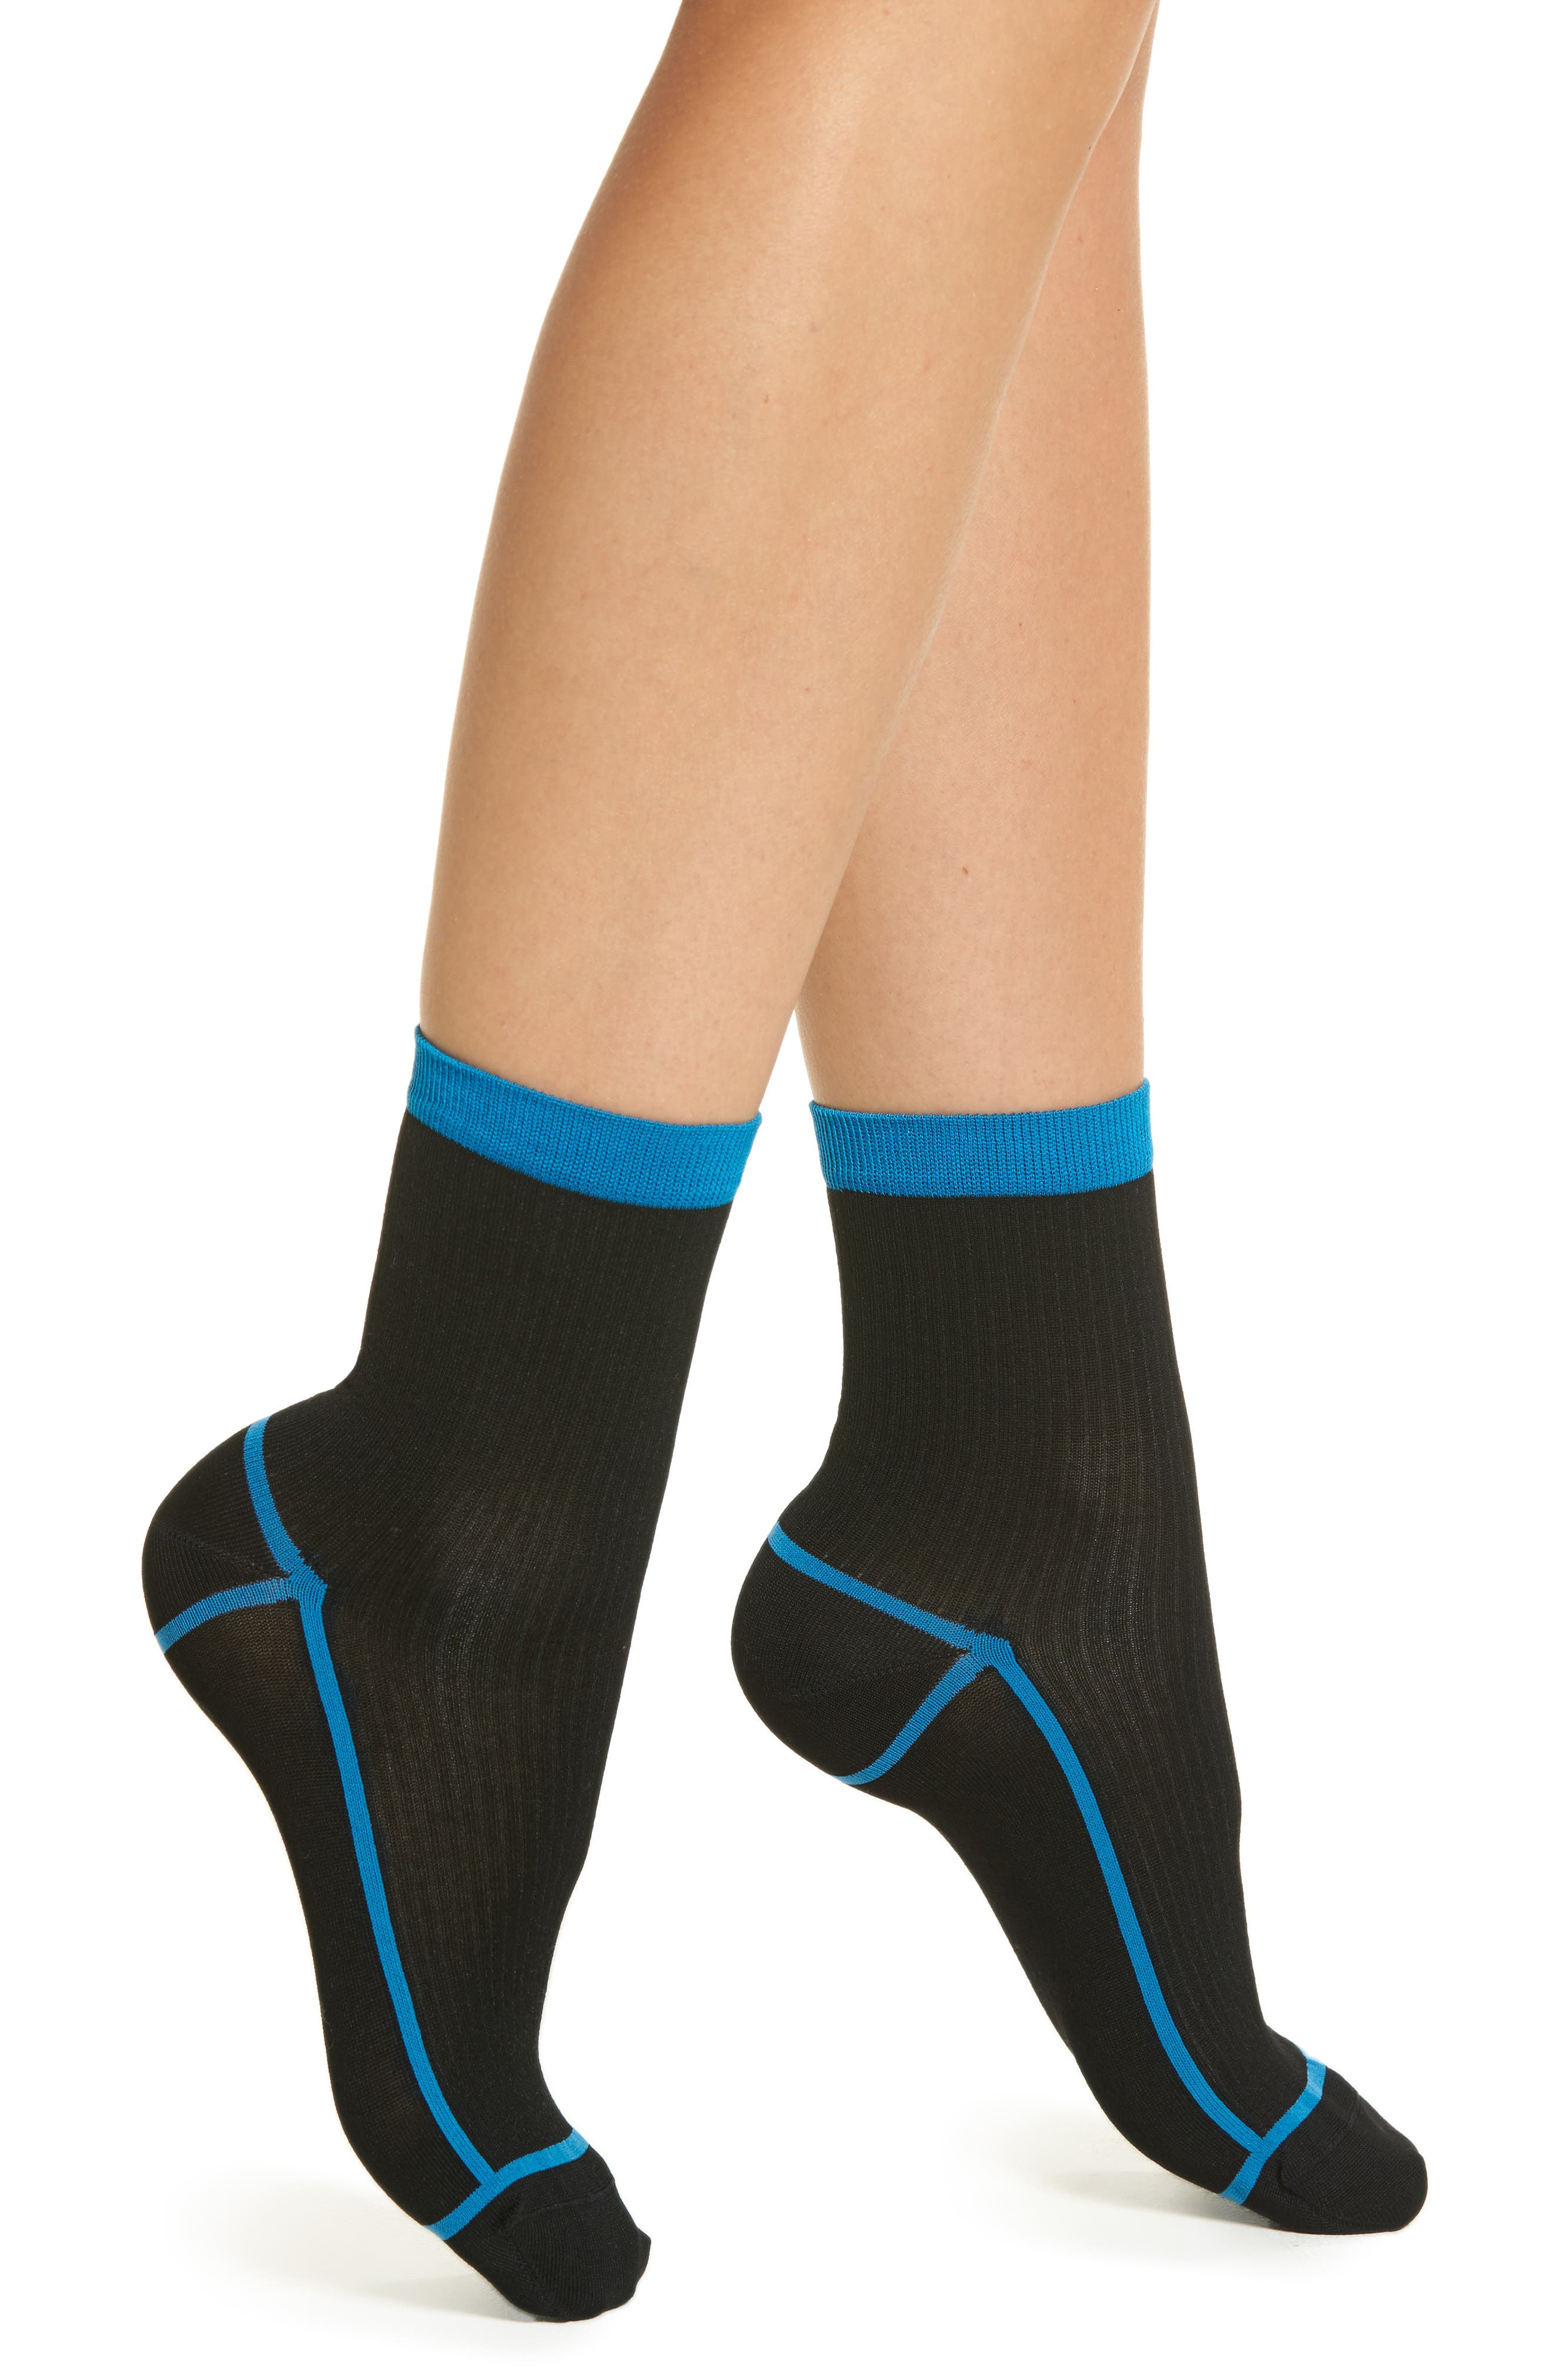 Lily Rib Ankle Socks,                             Main thumbnail 1, color,                             012